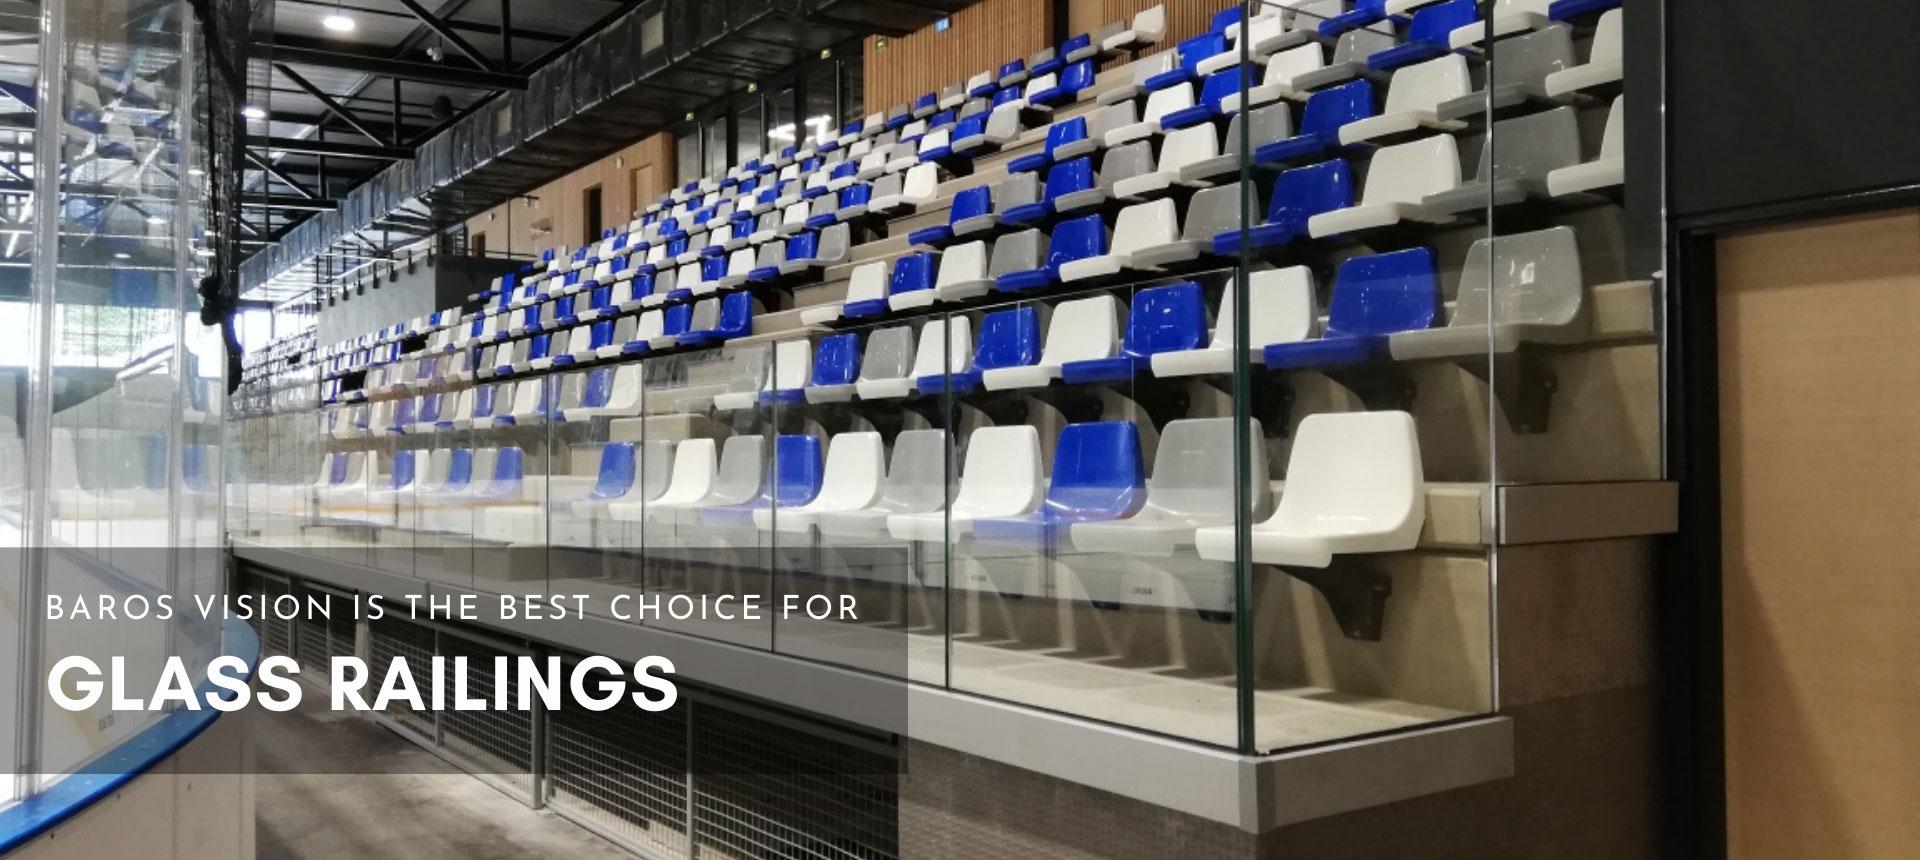 glass railings mounted on stadium